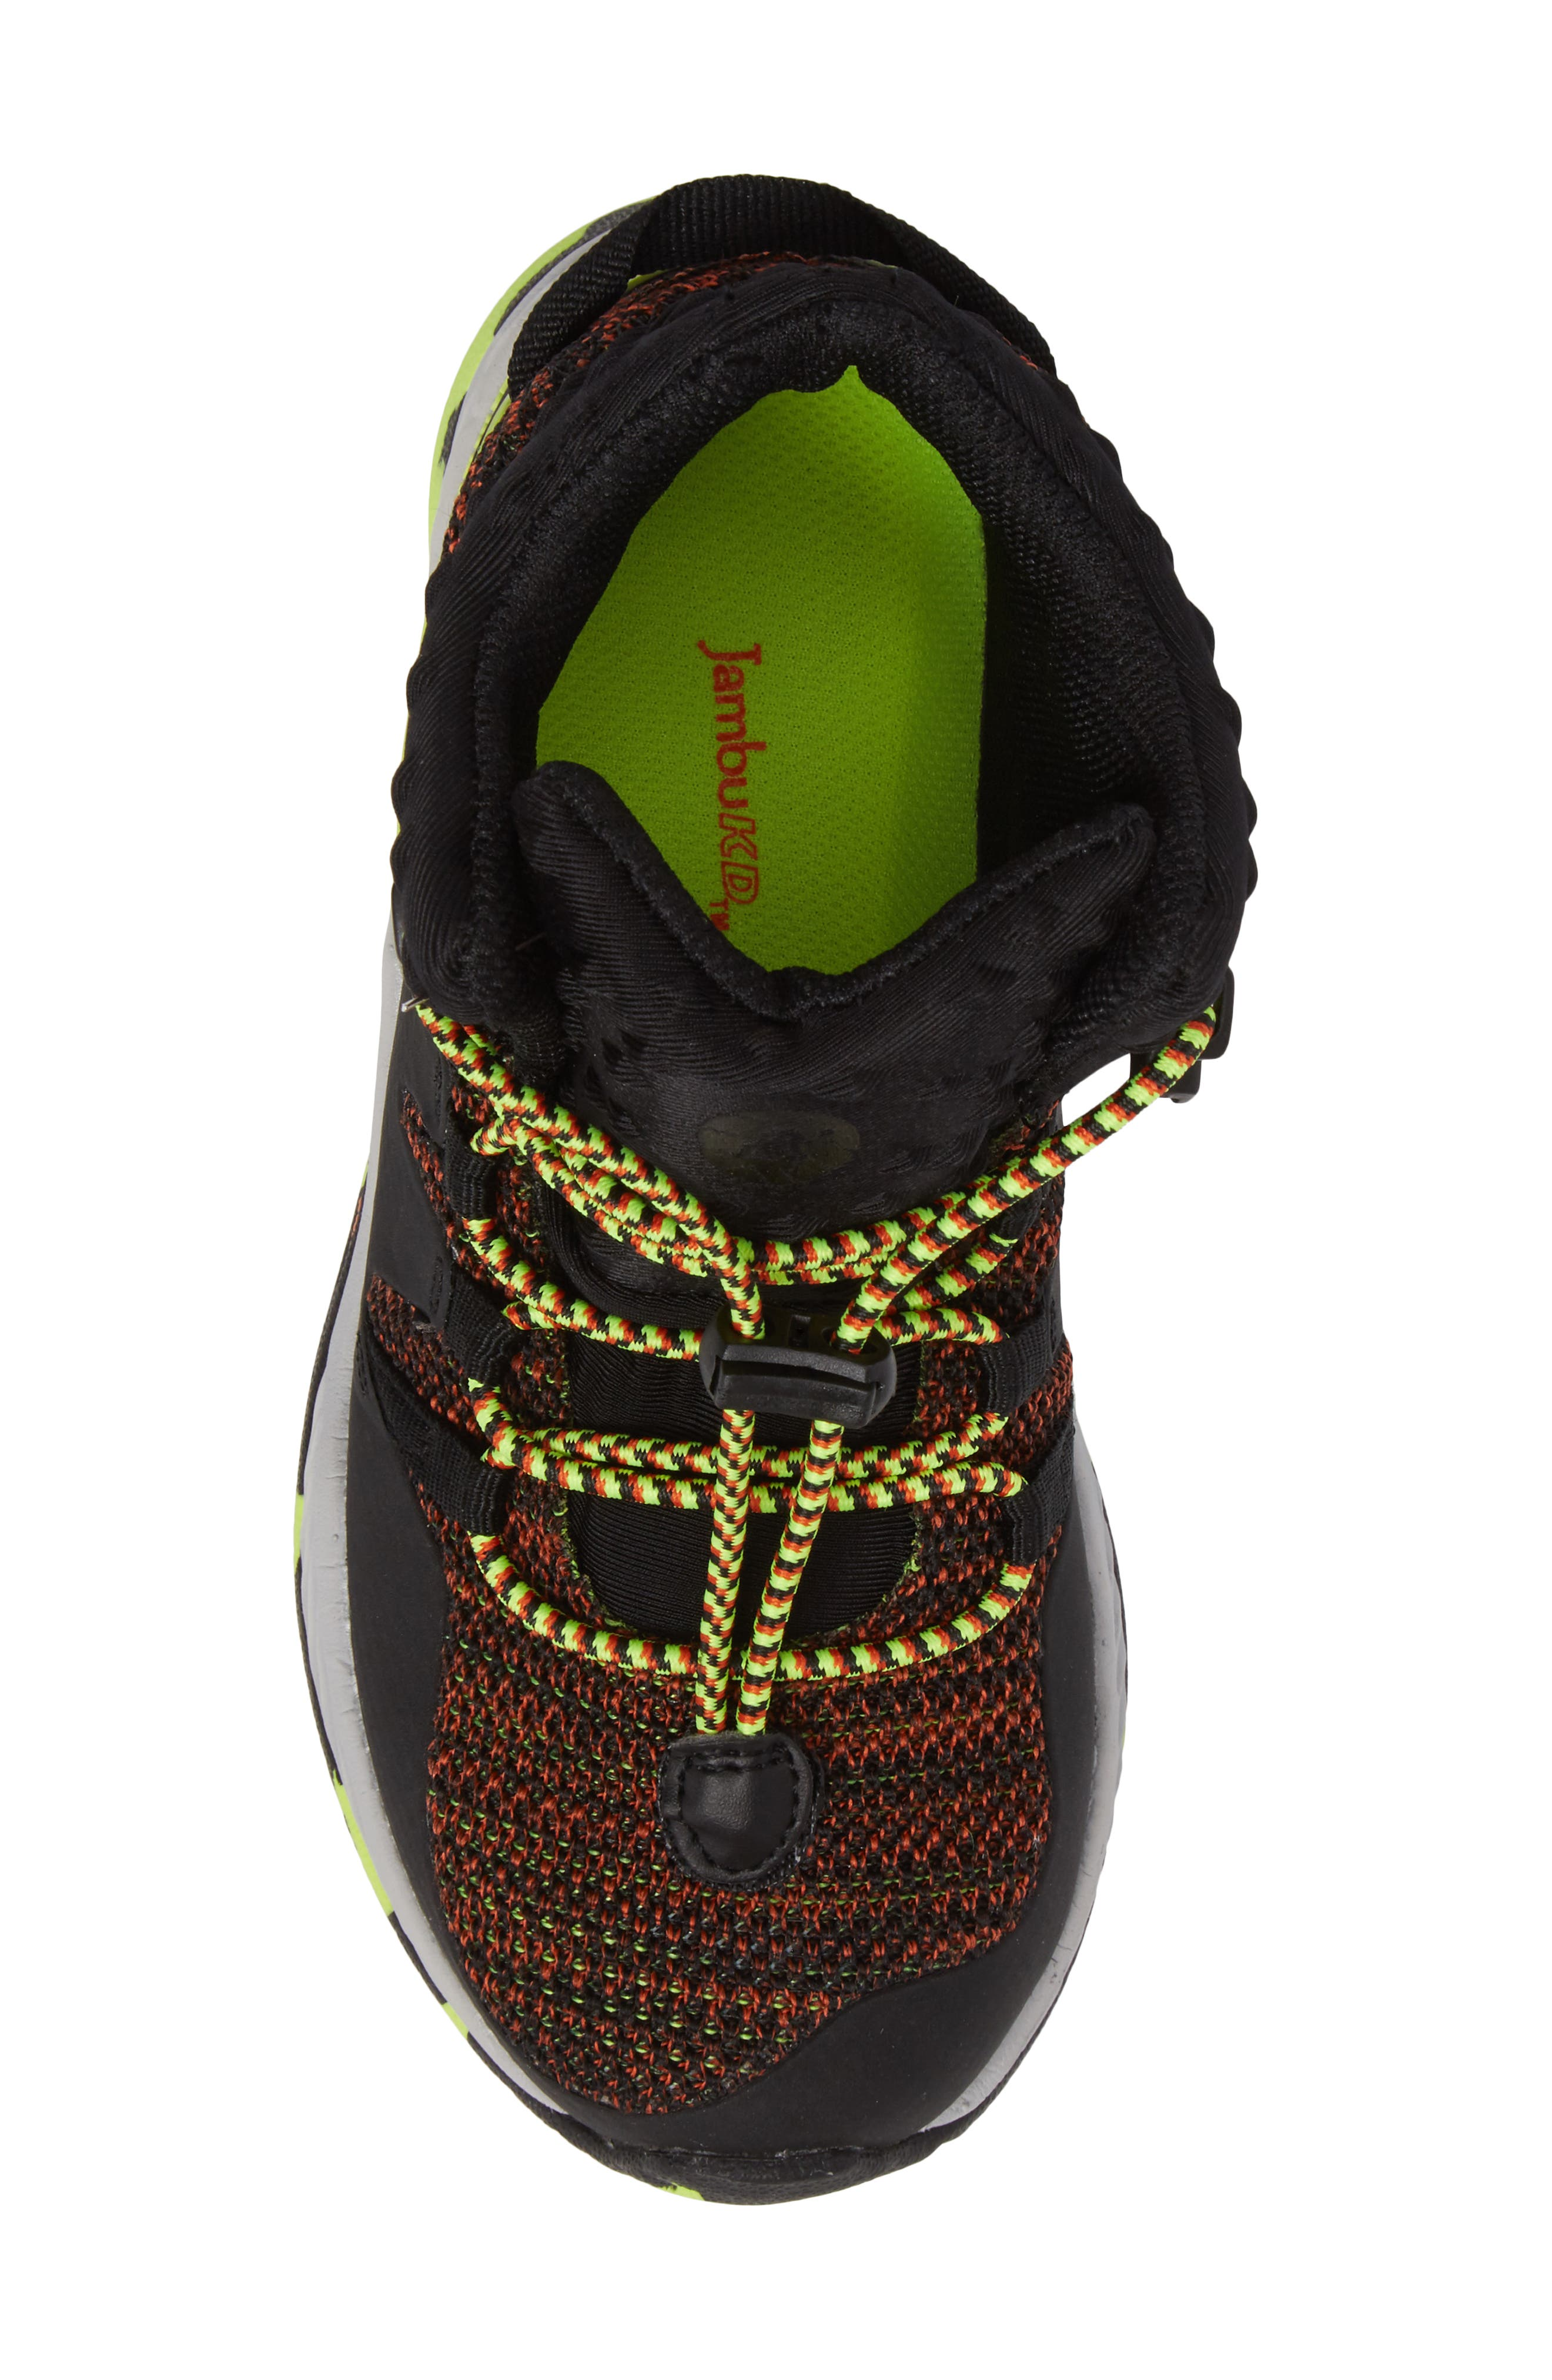 Armadillo Sneaker Boot,                             Alternate thumbnail 5, color,                             Black